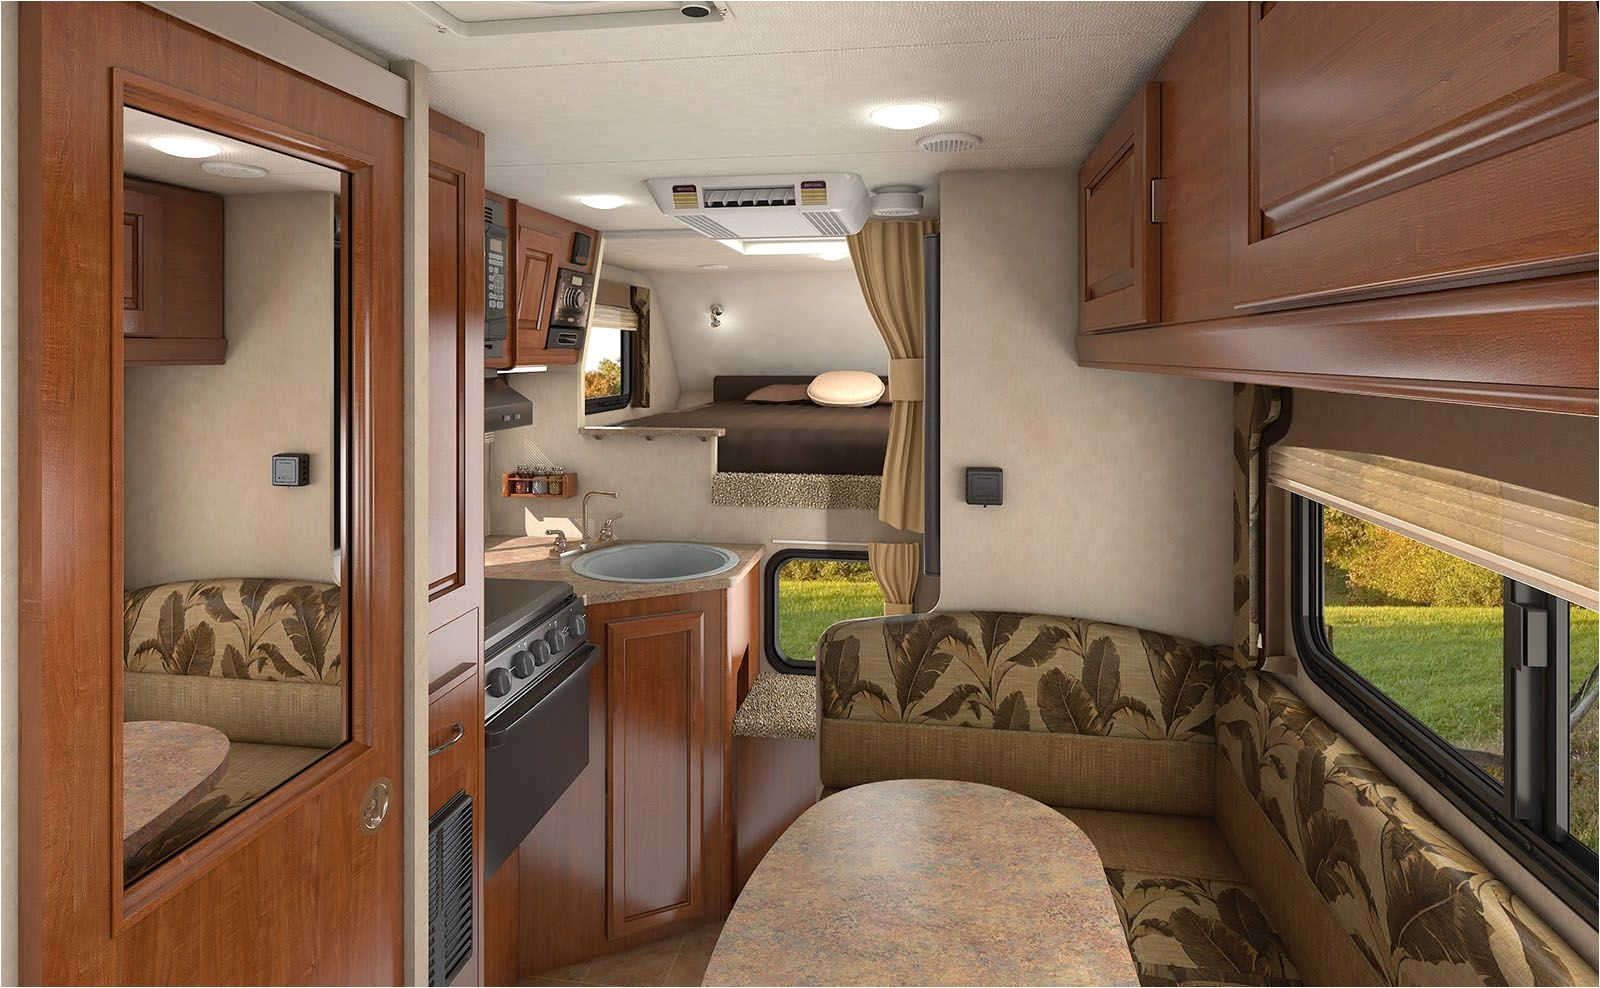 lance 865 truck camper for short bed trucks dry 2 011 lbs wet 2 896 lbs overall 16 5 floor 8 7 width 86 msrp 21 938